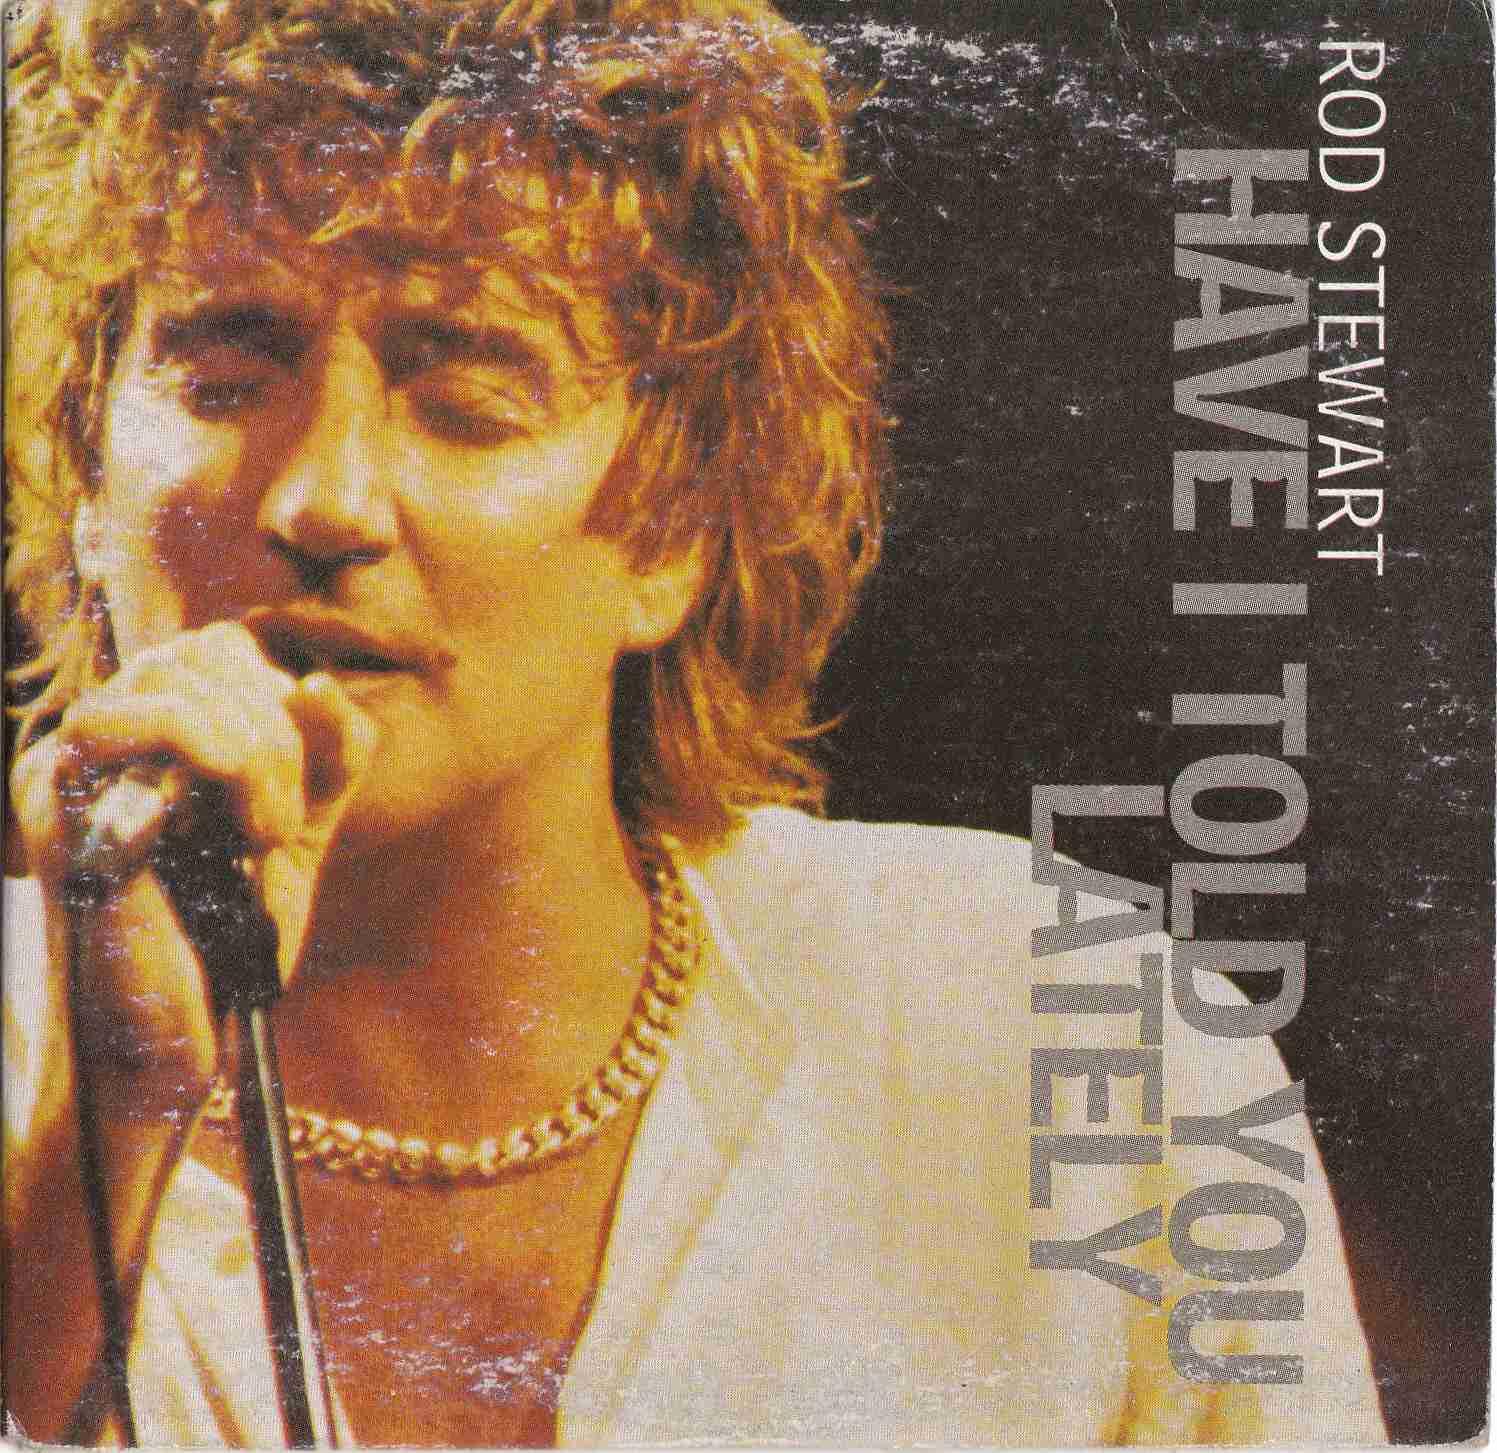 10 Best Rod Stewart Songs of All Time